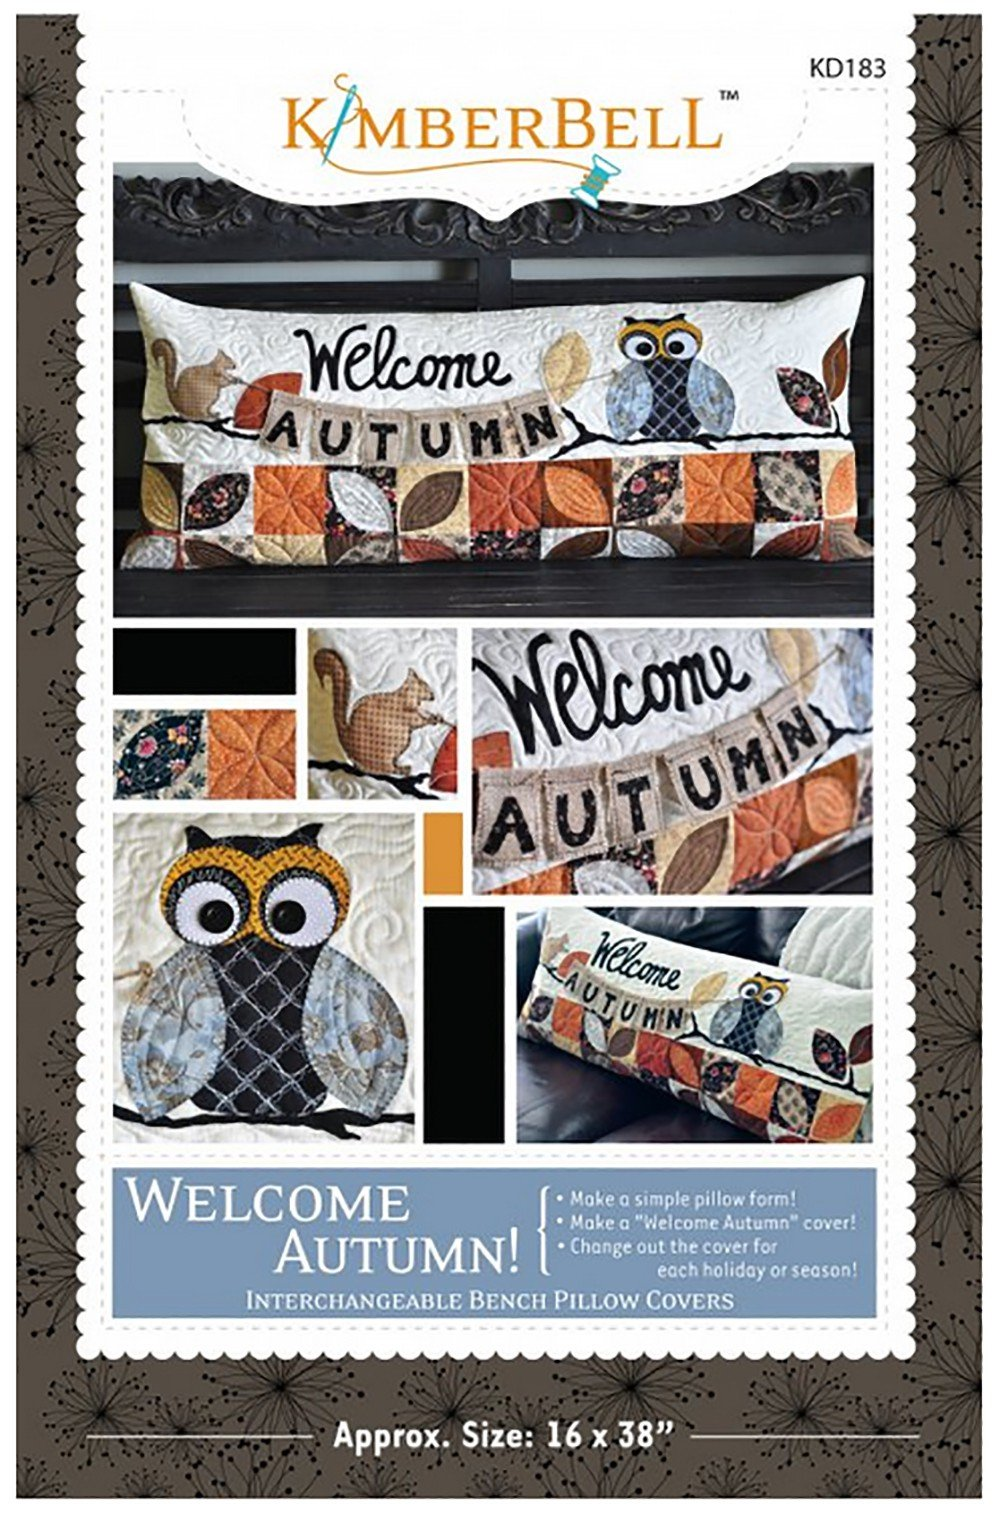 Welcome Autumn Bench Pillow